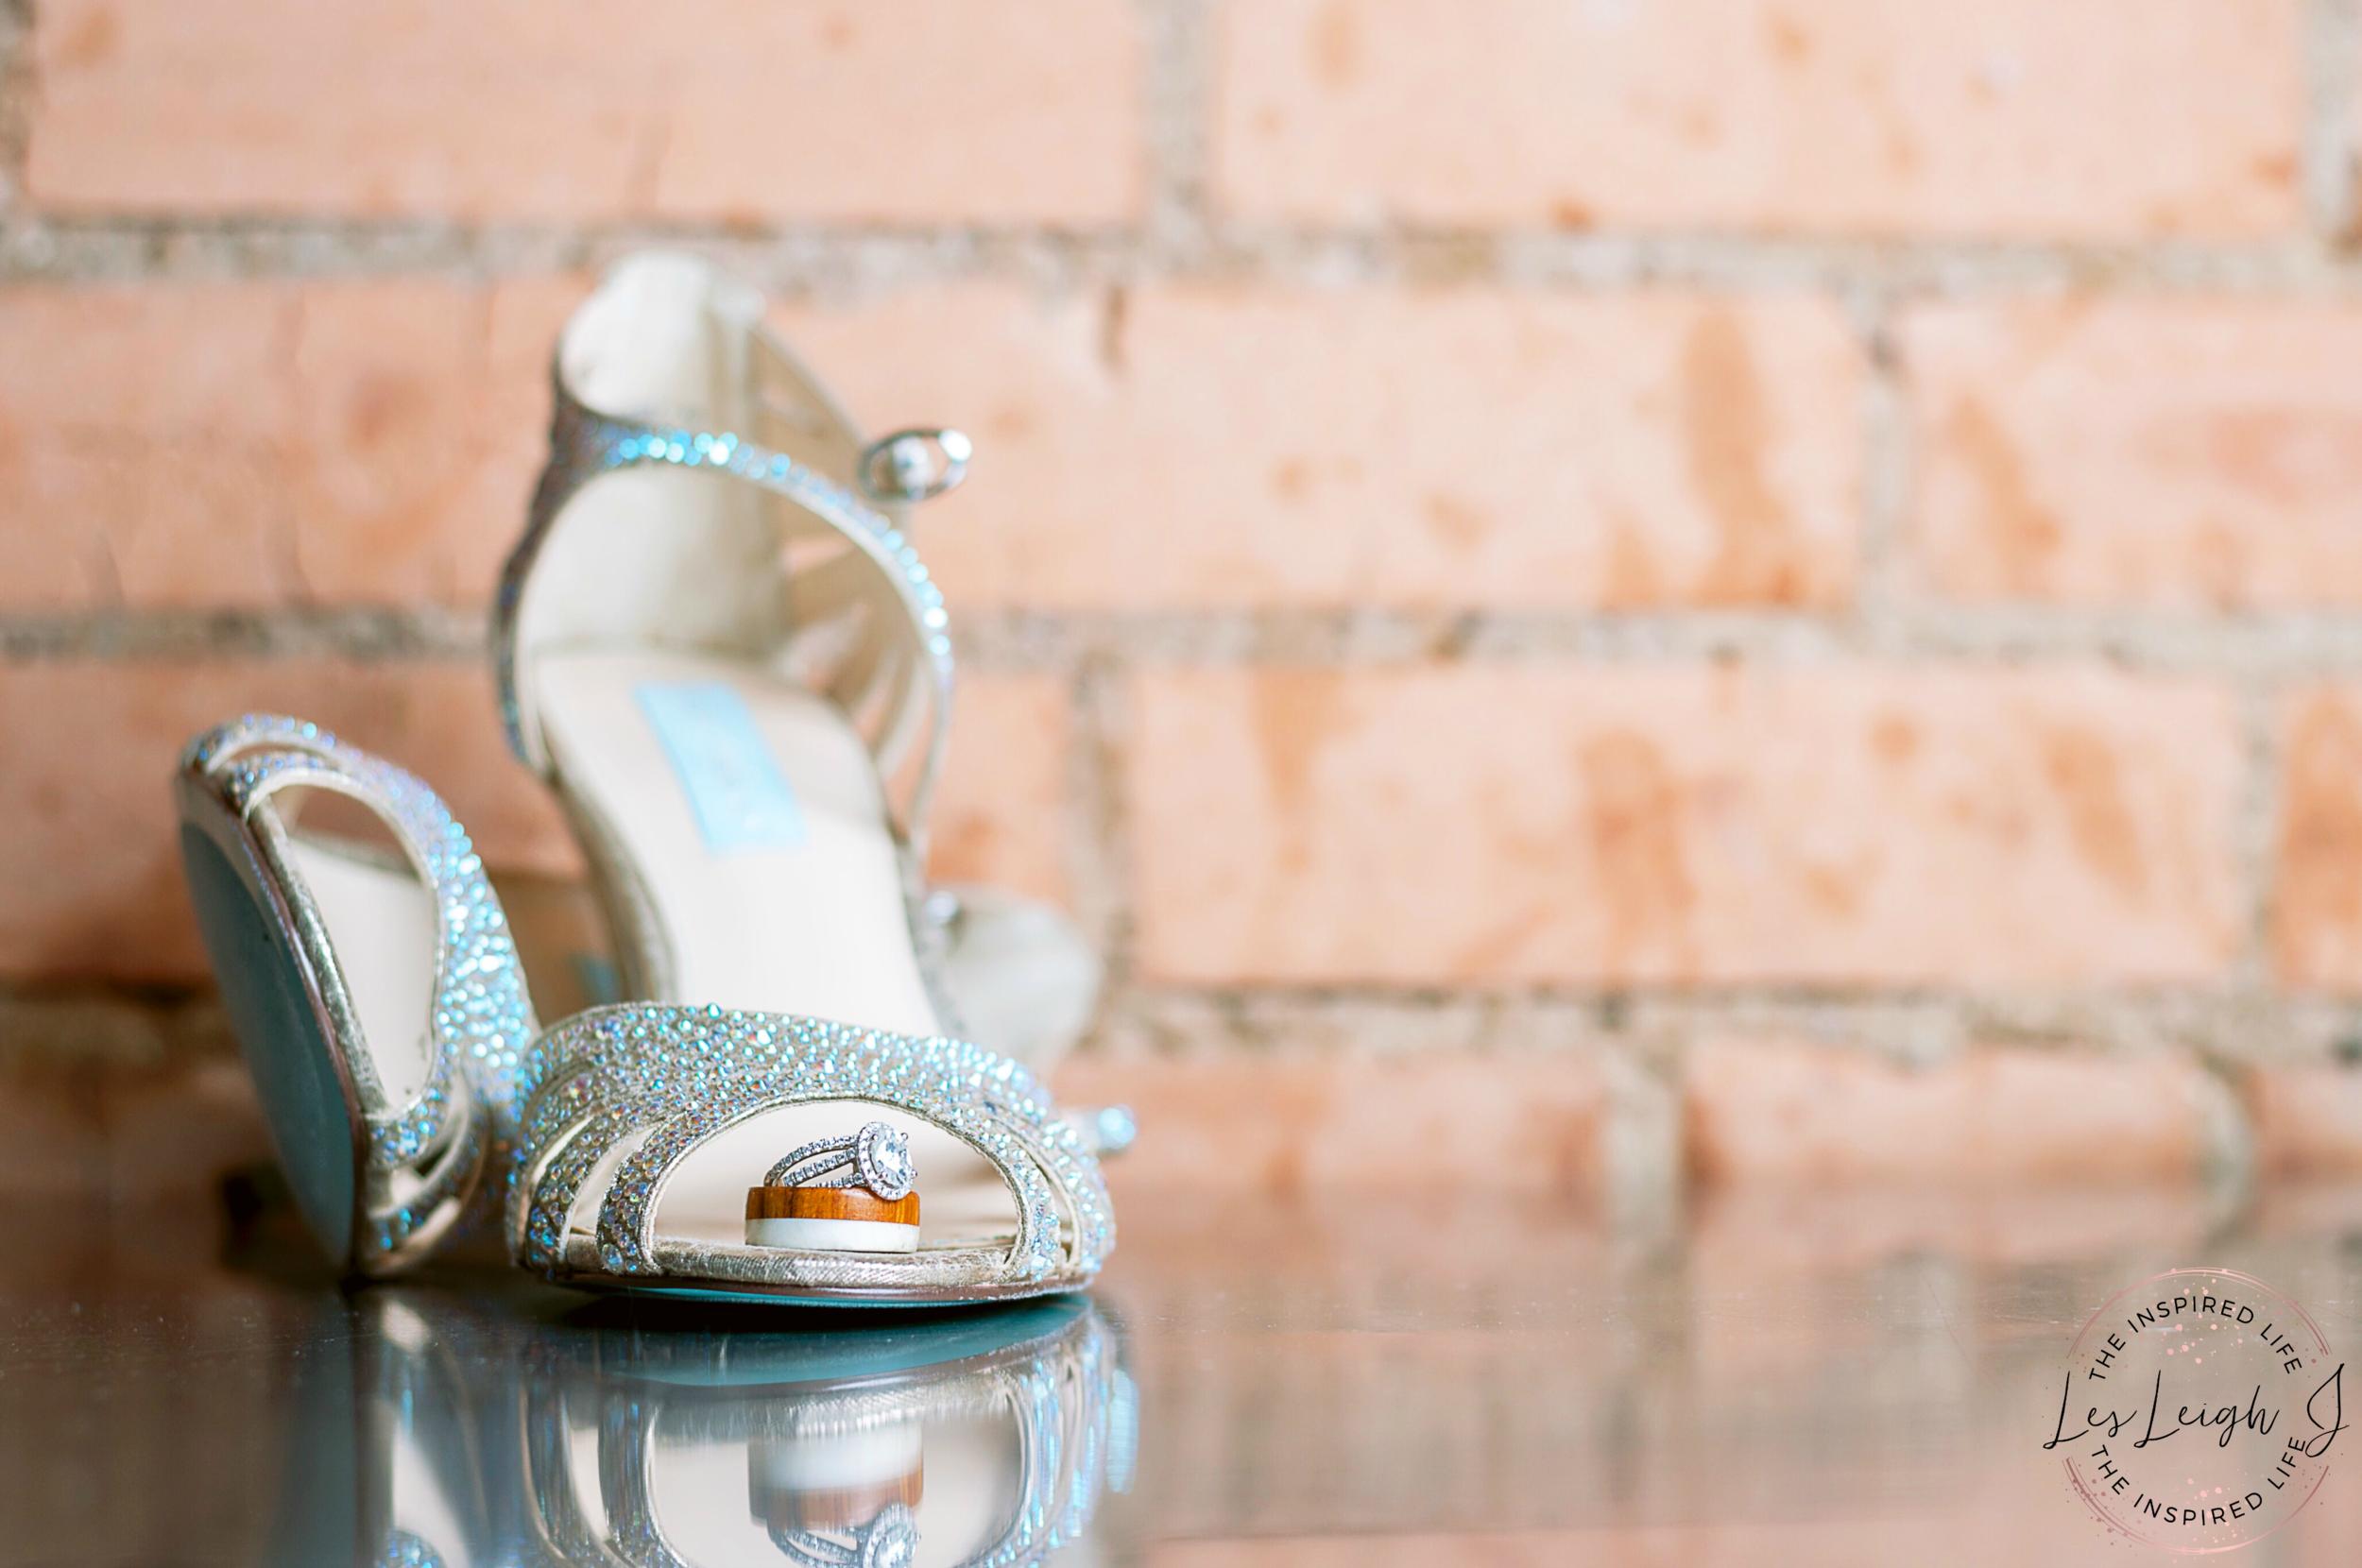 Betsey Johnson Shoes & Wedding Rings